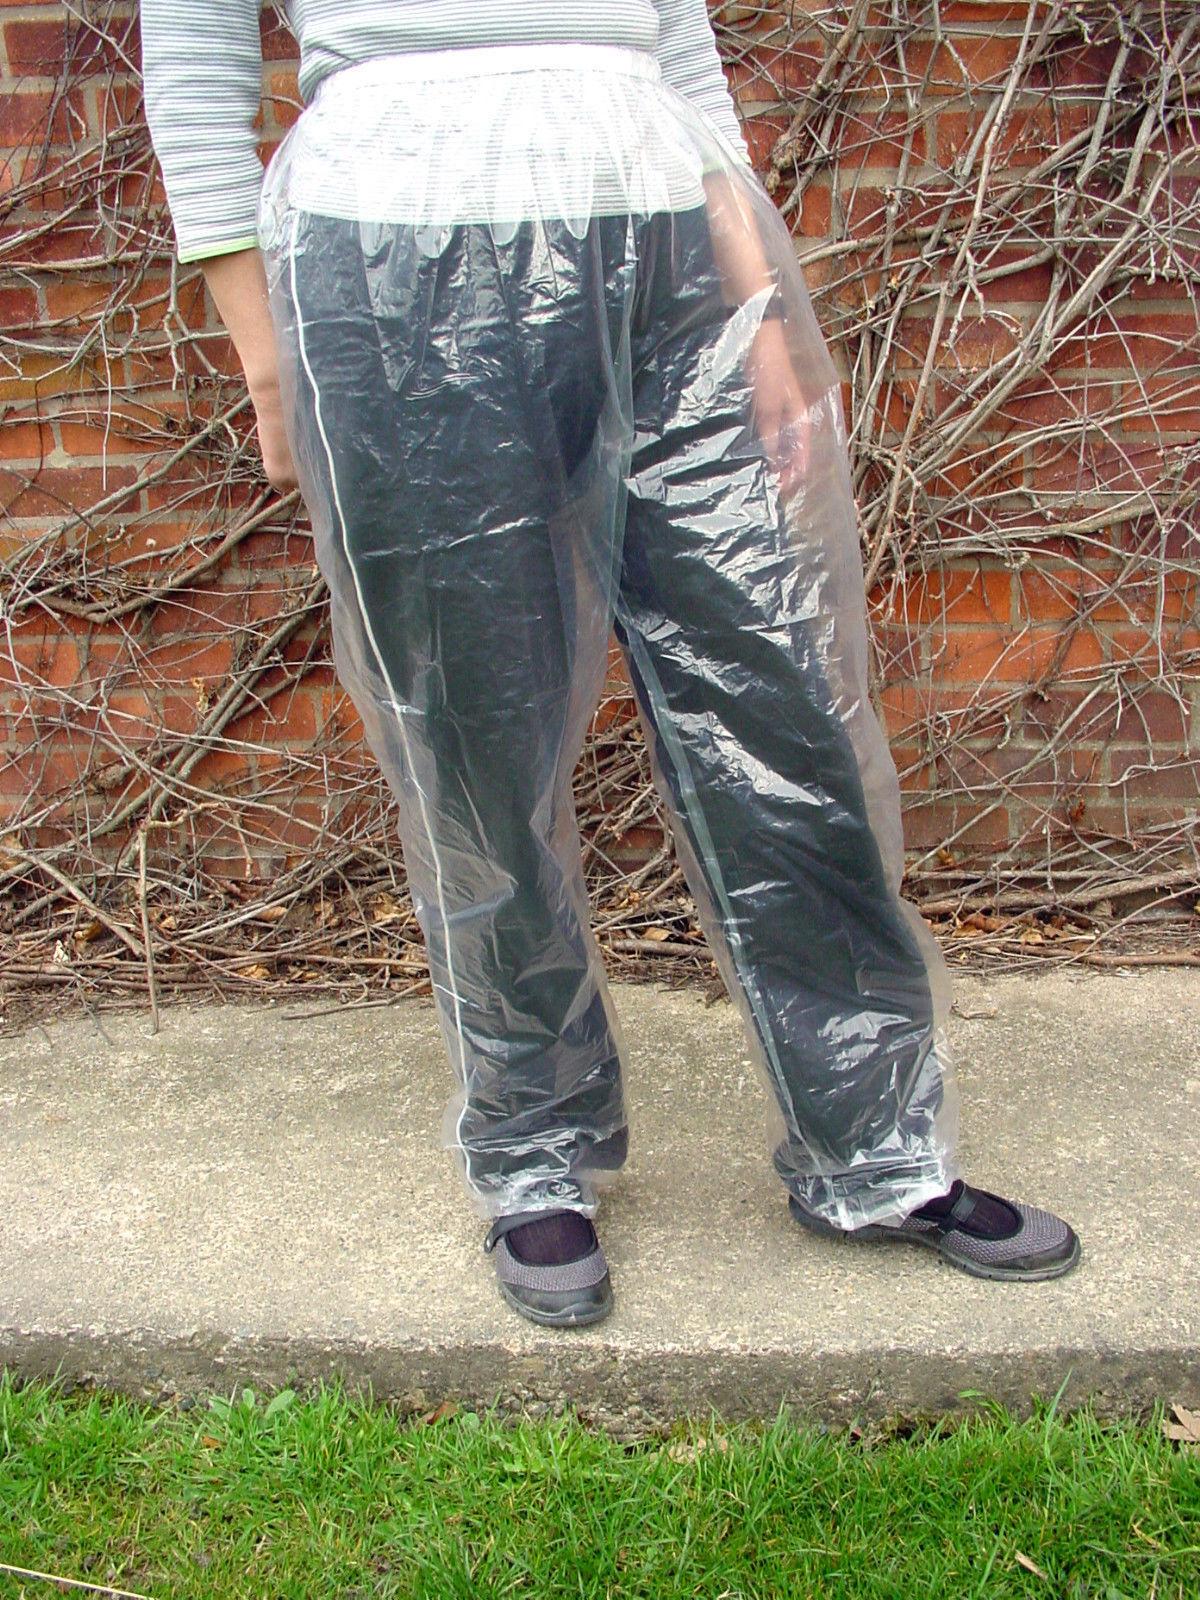 4X Desechable Pvc Pantalones Transparente Plástico Impermeable Impermeable Impermeable Festival Pesca  entrega gratis